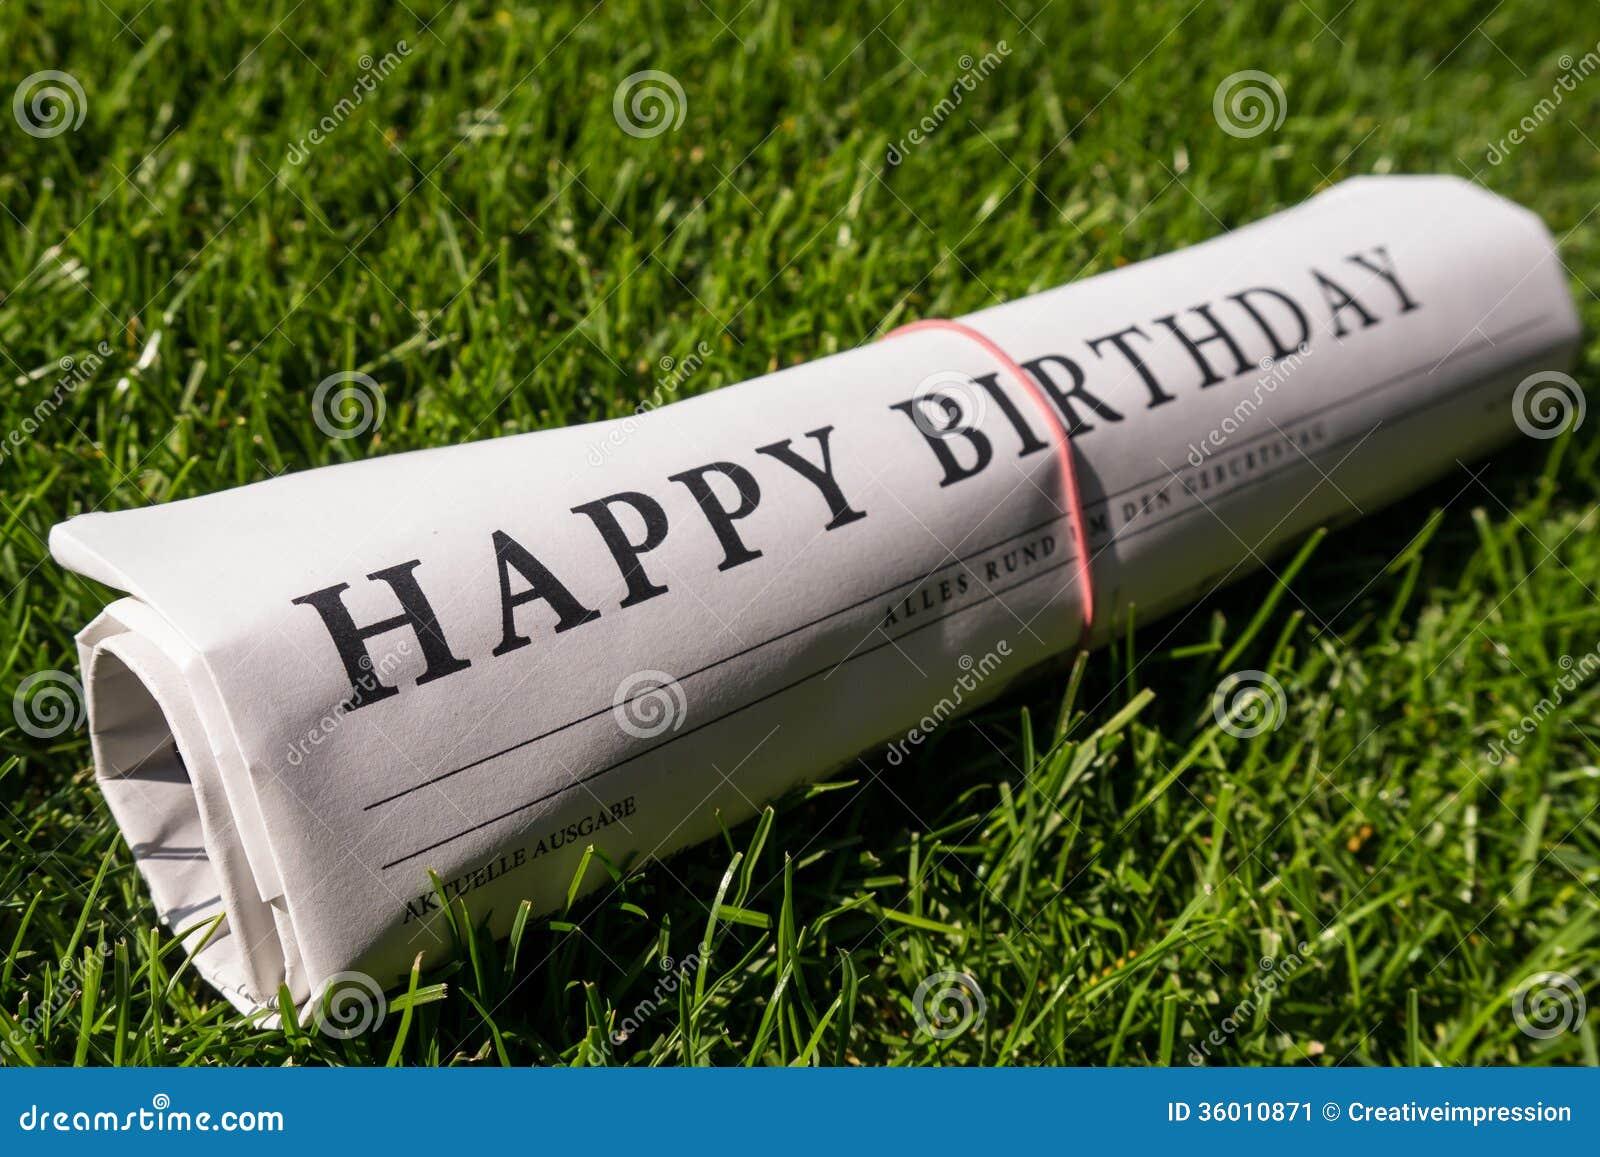 Reporter Birthday Cake